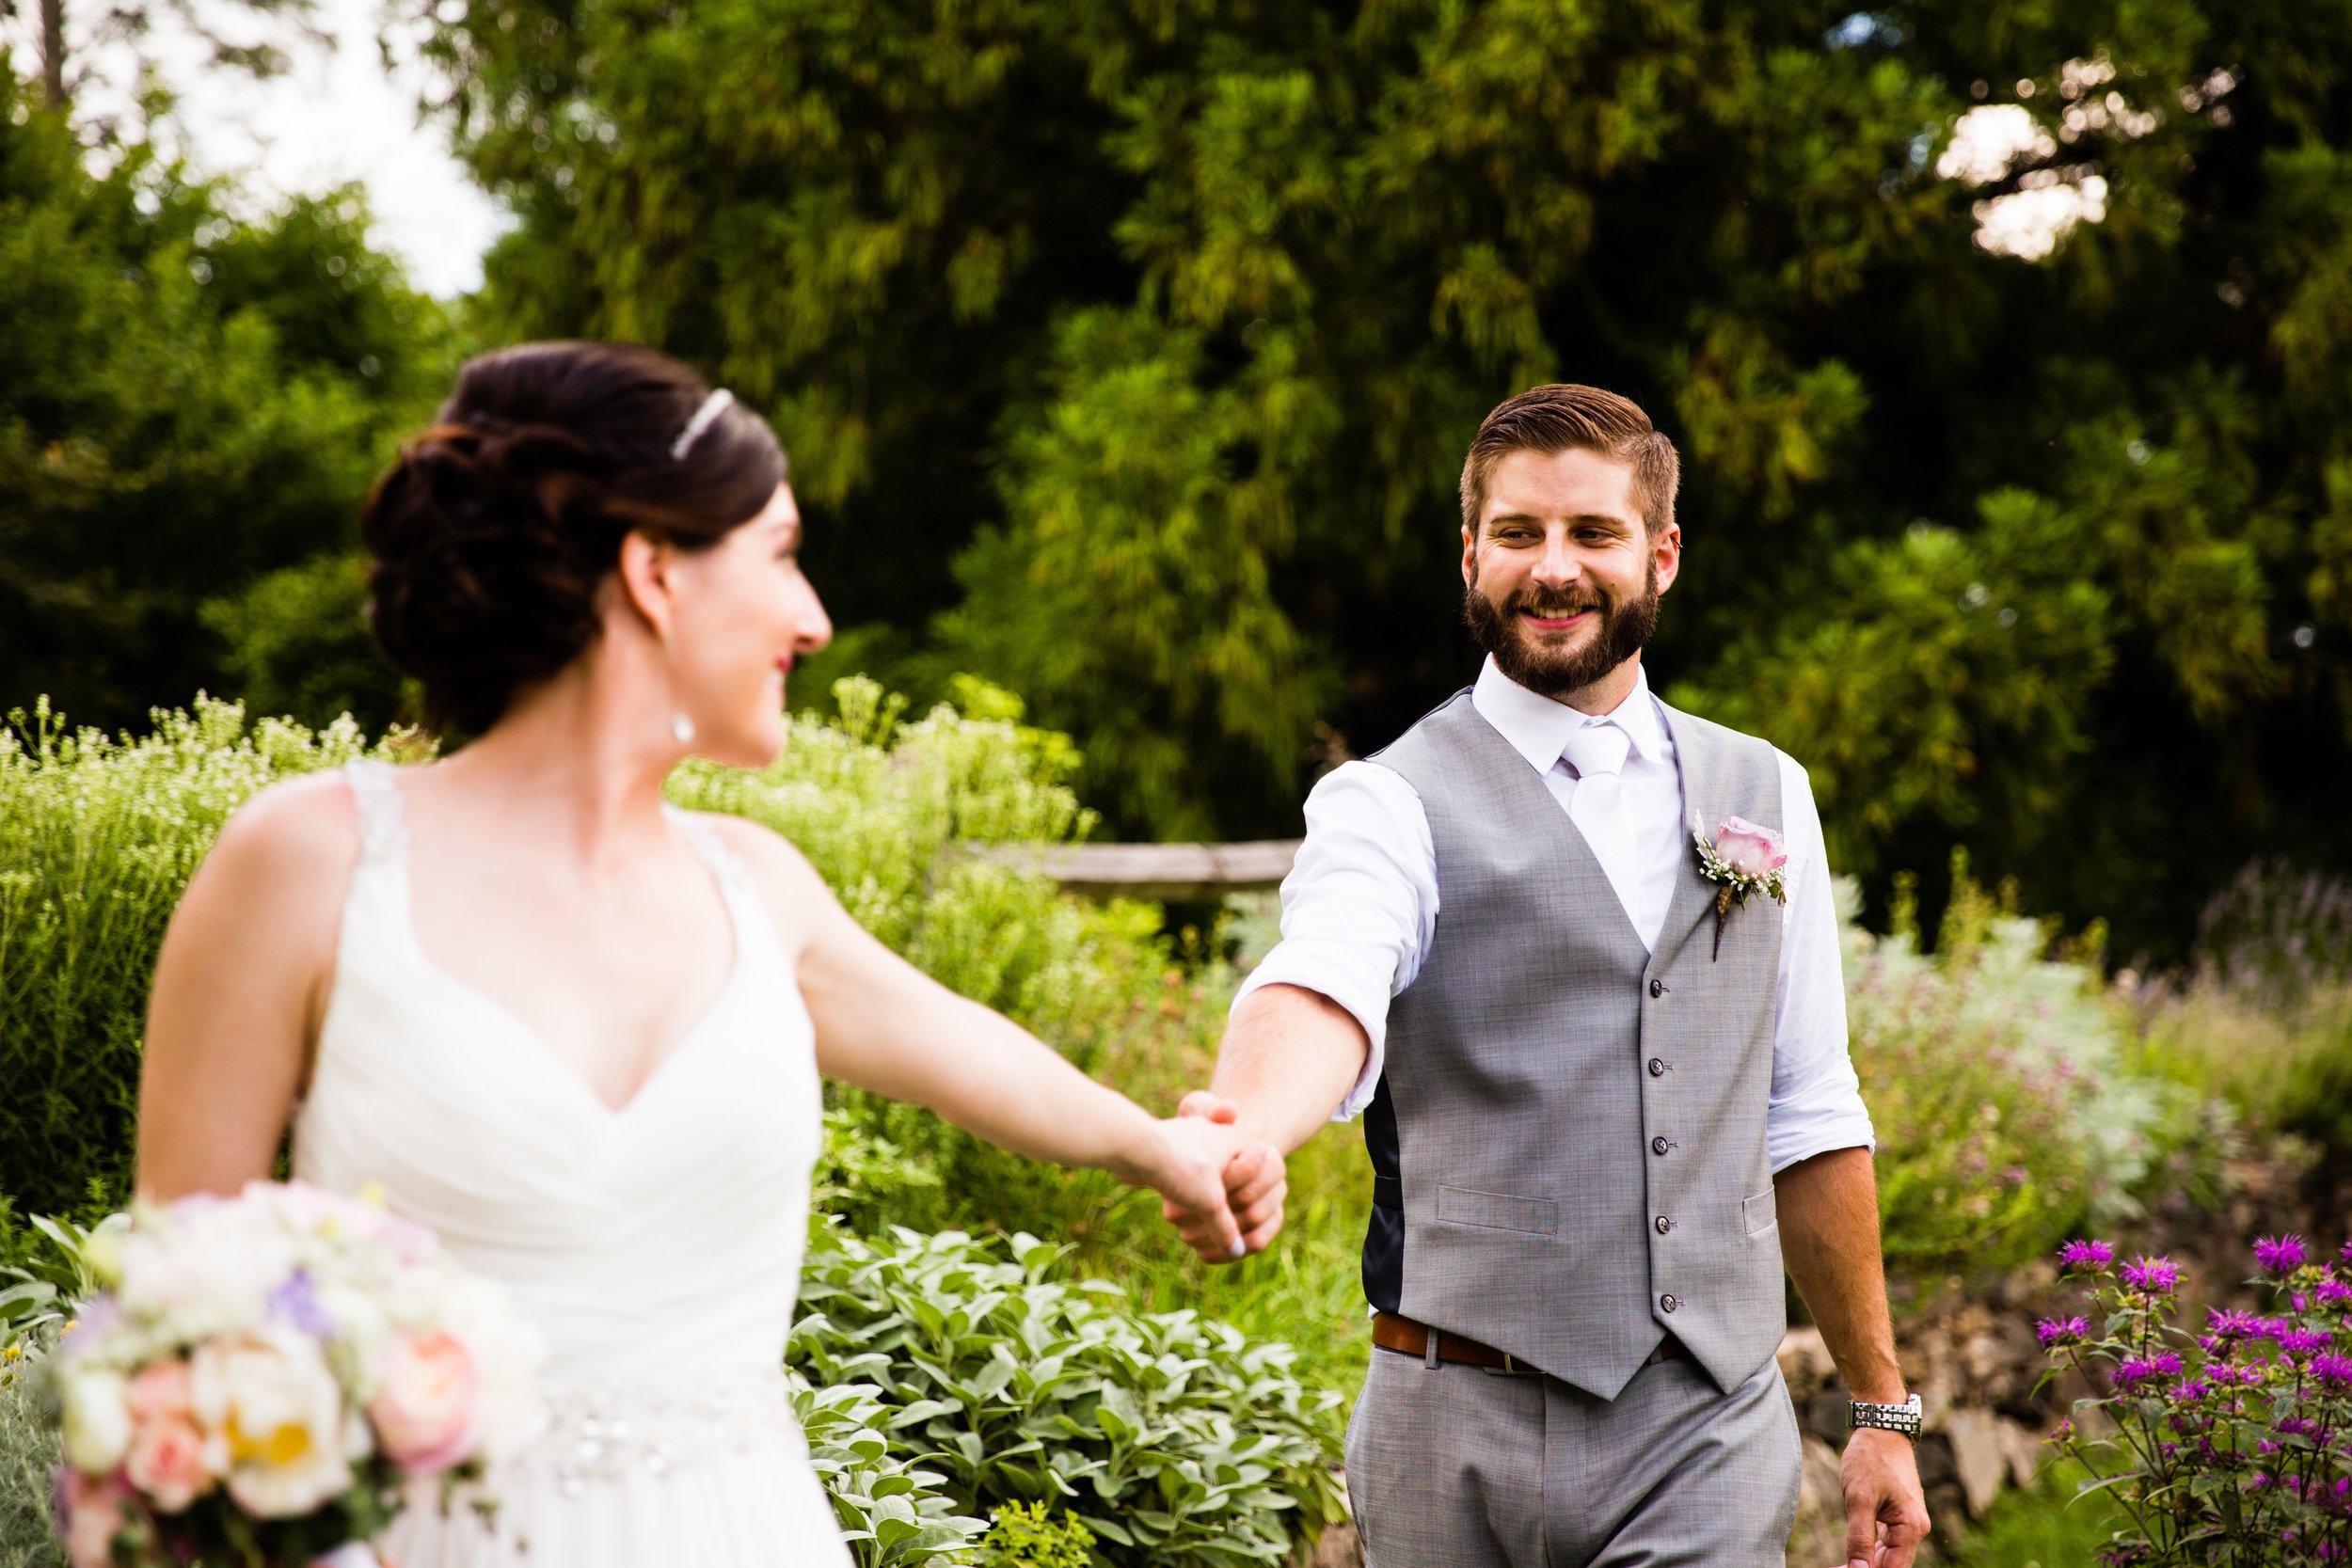 TYLER ARBORETUM WEDDING PHOTOGRAPHY LOVESTRUCK PICTURES-040.jpg